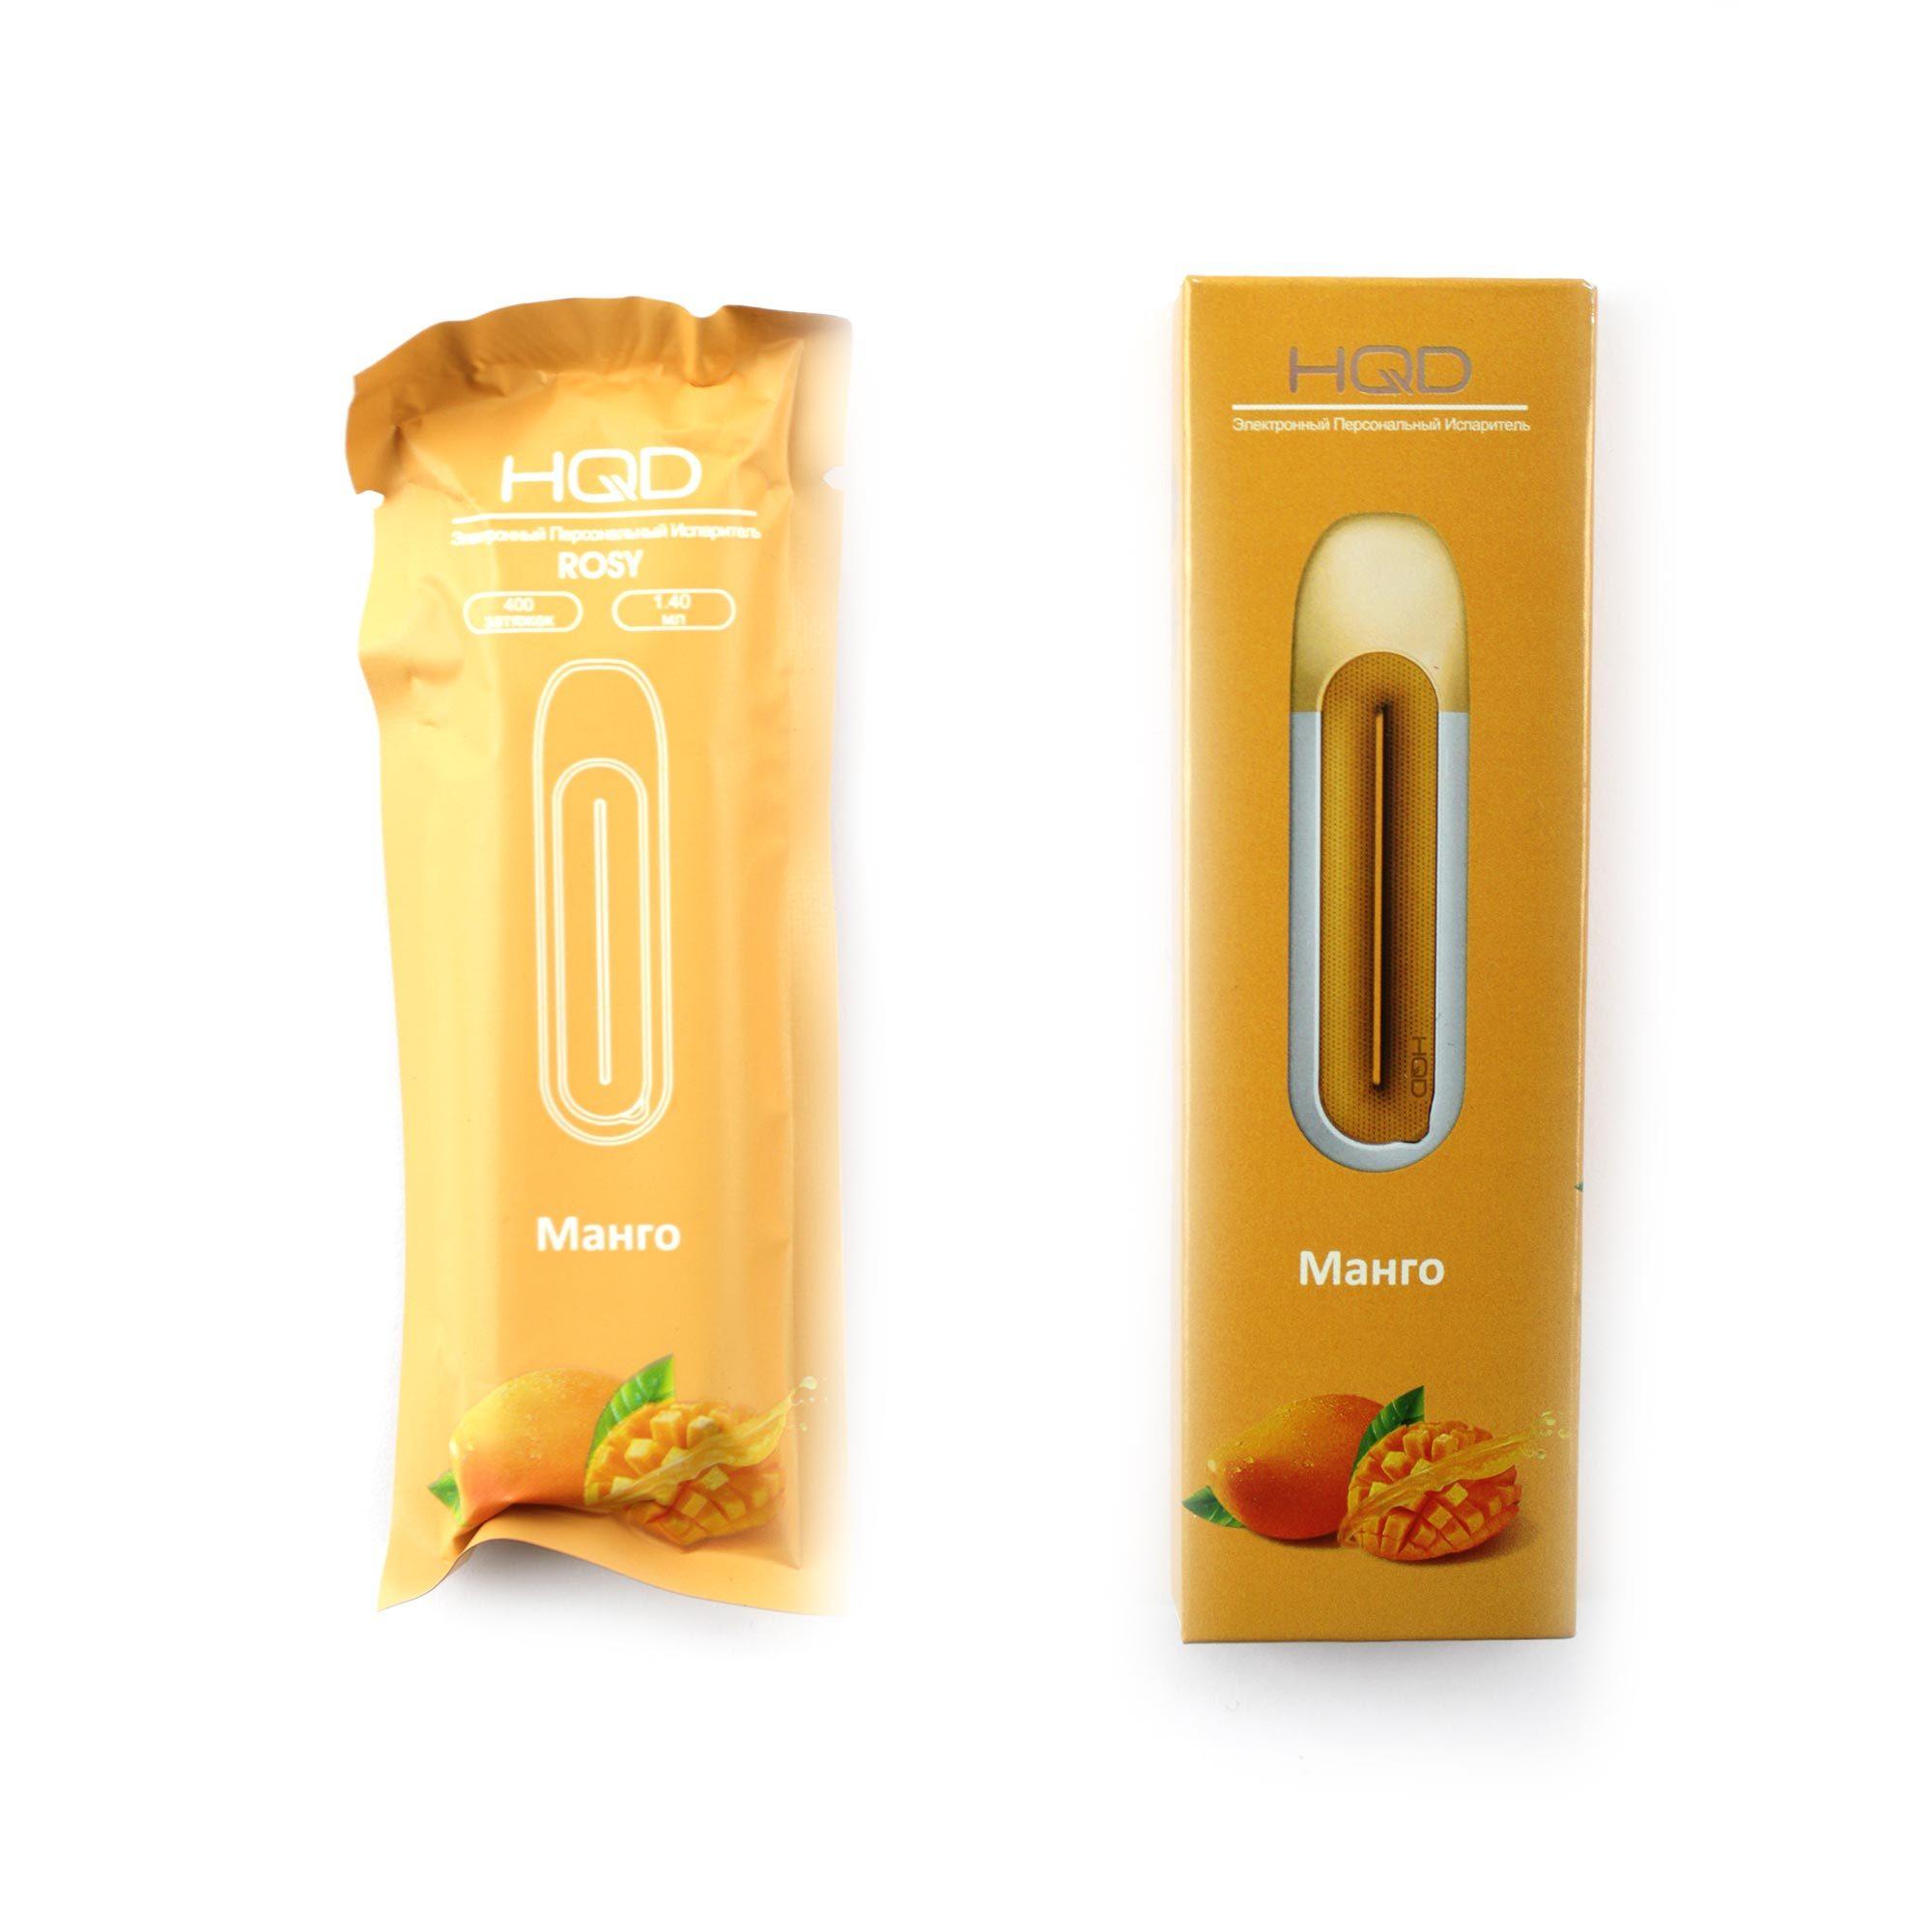 Одноразовая электронная сигарета HQD Rosy Mango (Манго)